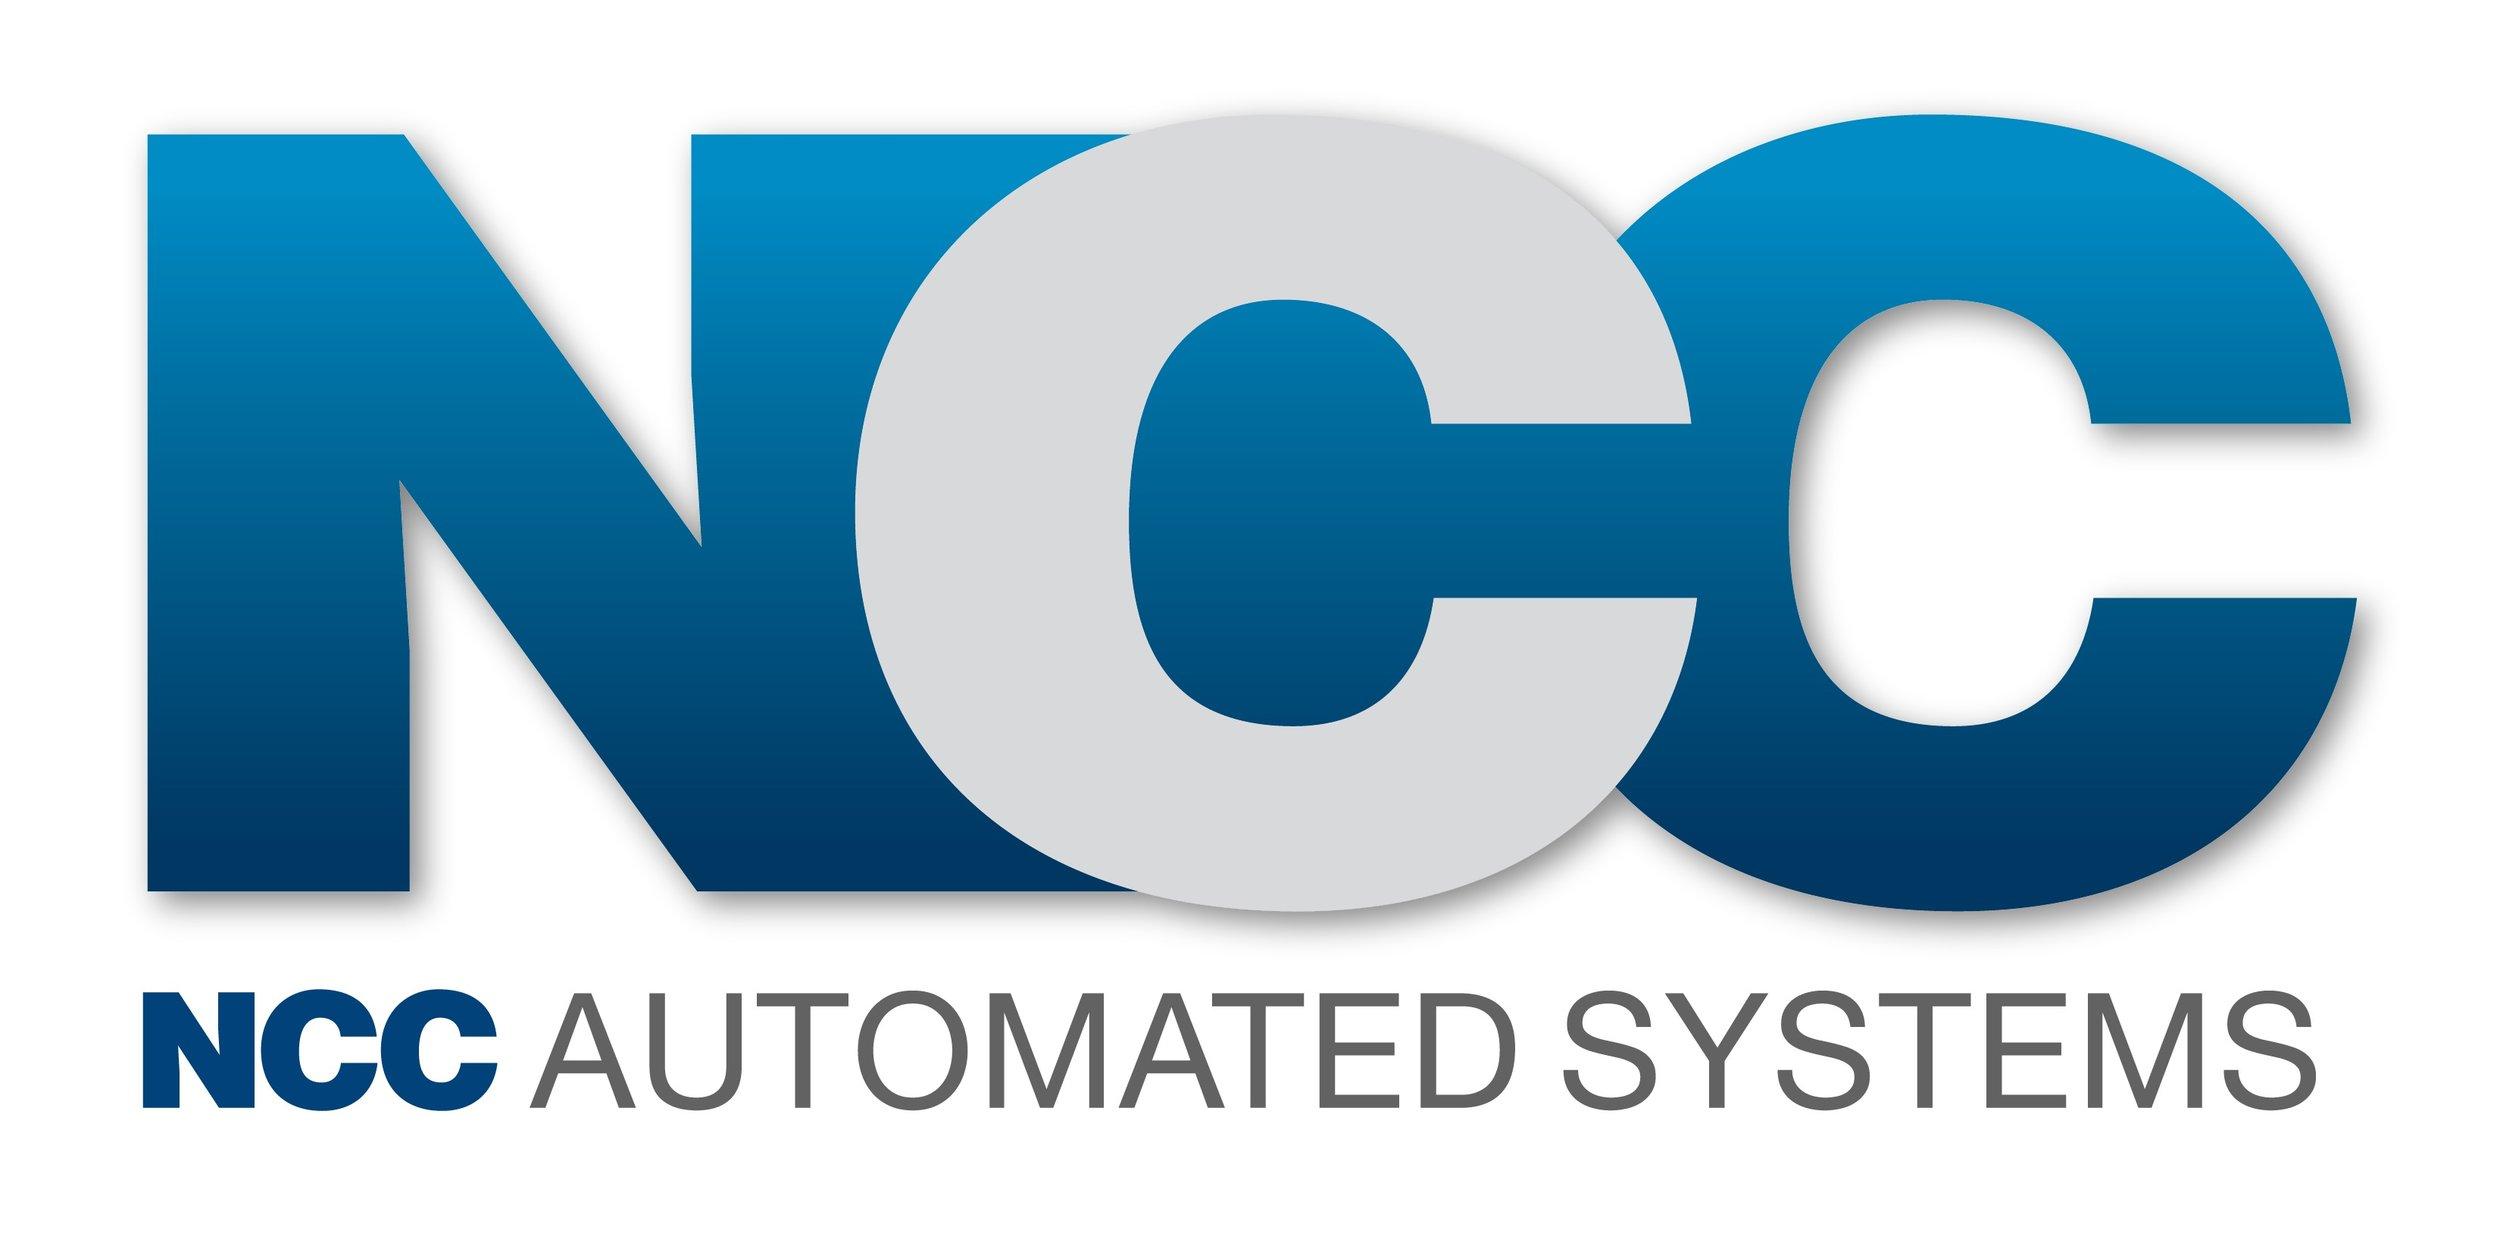 NCCAutomatedSystemsLogoColor - 2016.jpg